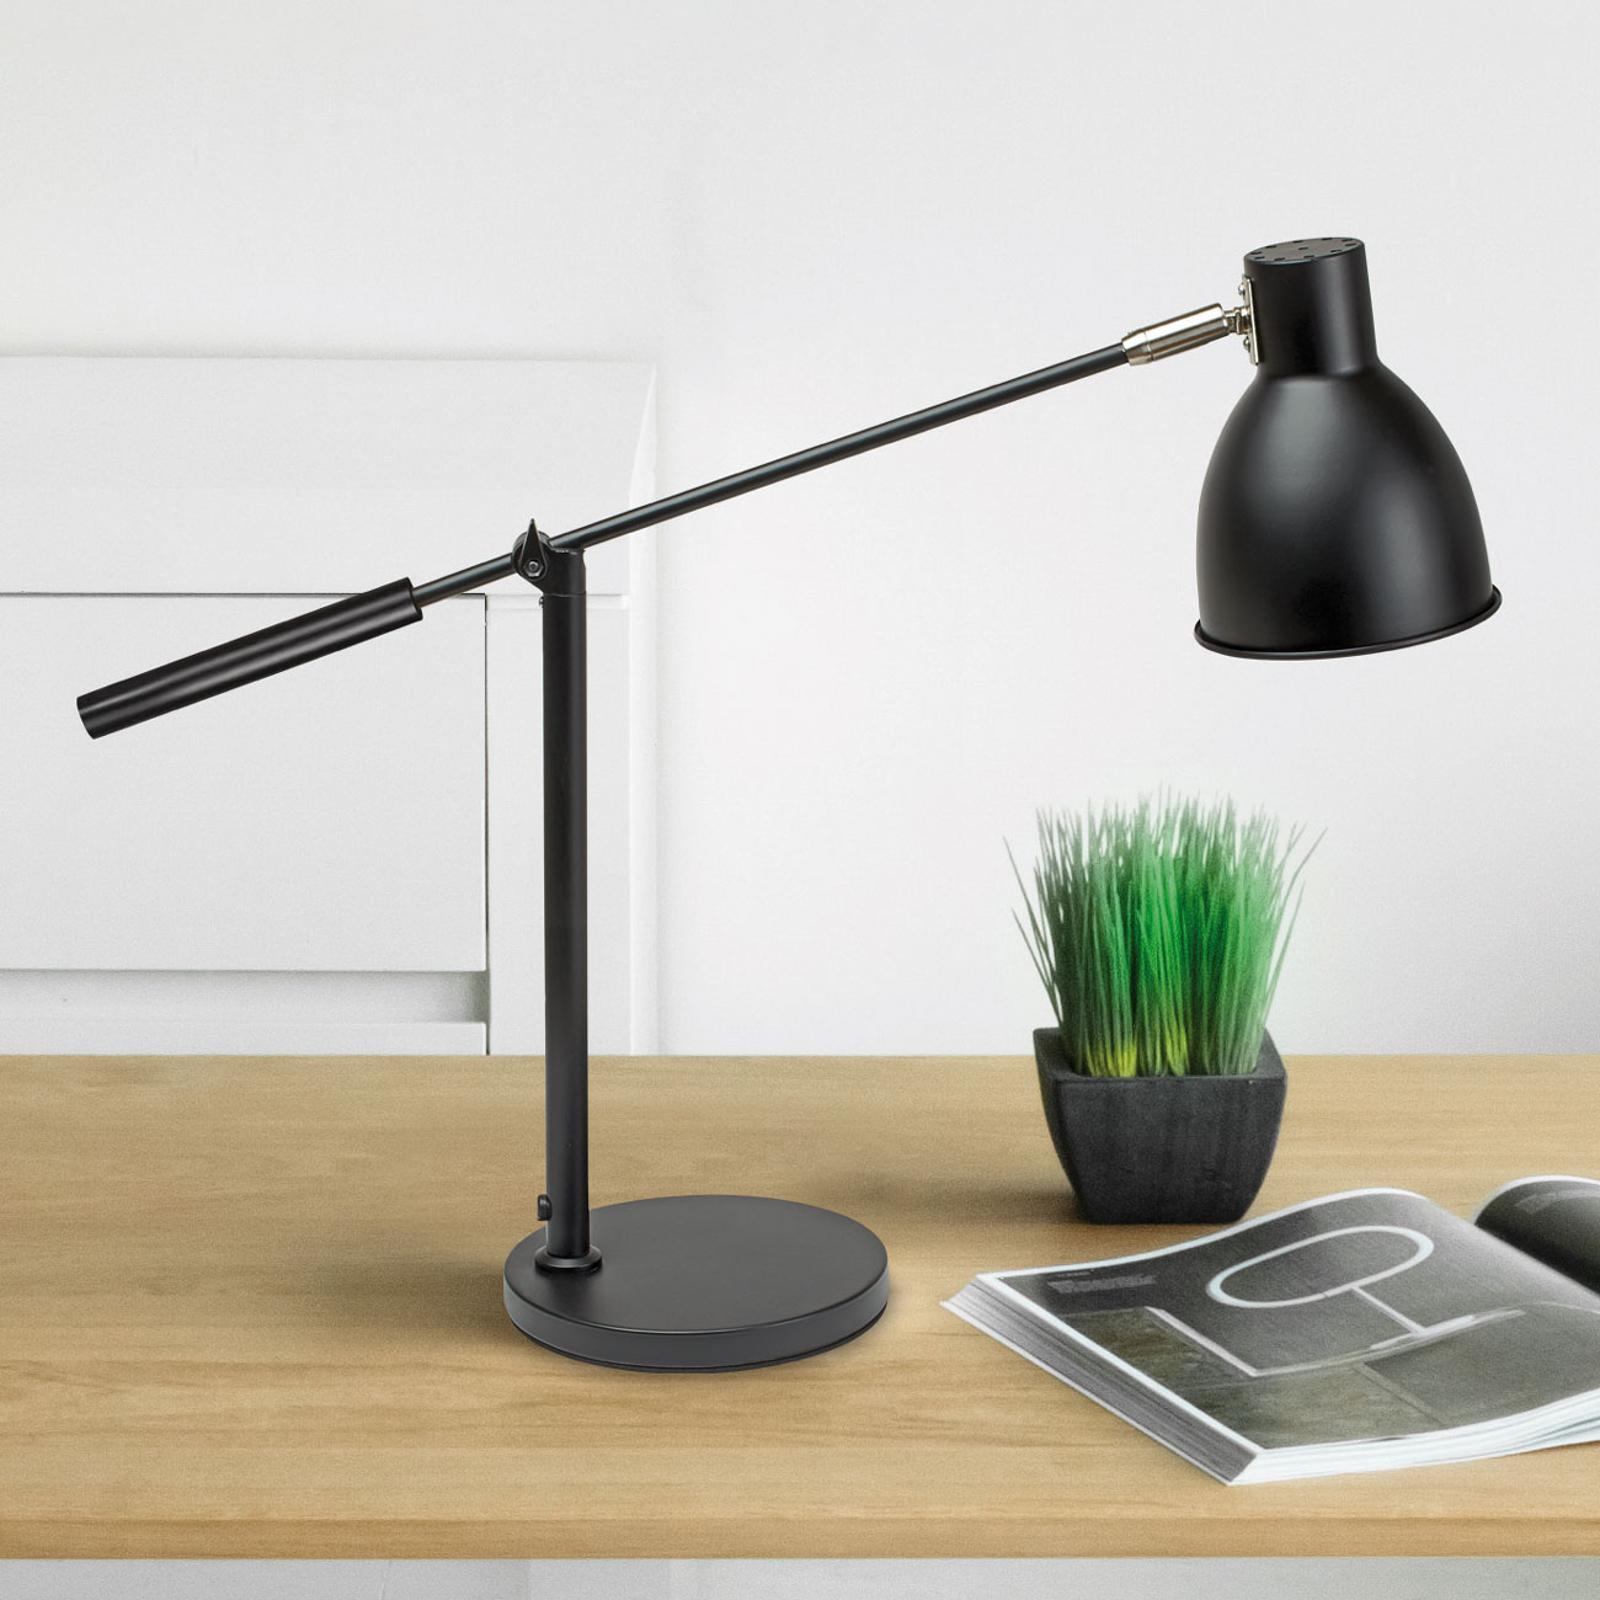 Tafellamp MAULfinja in mat zwart